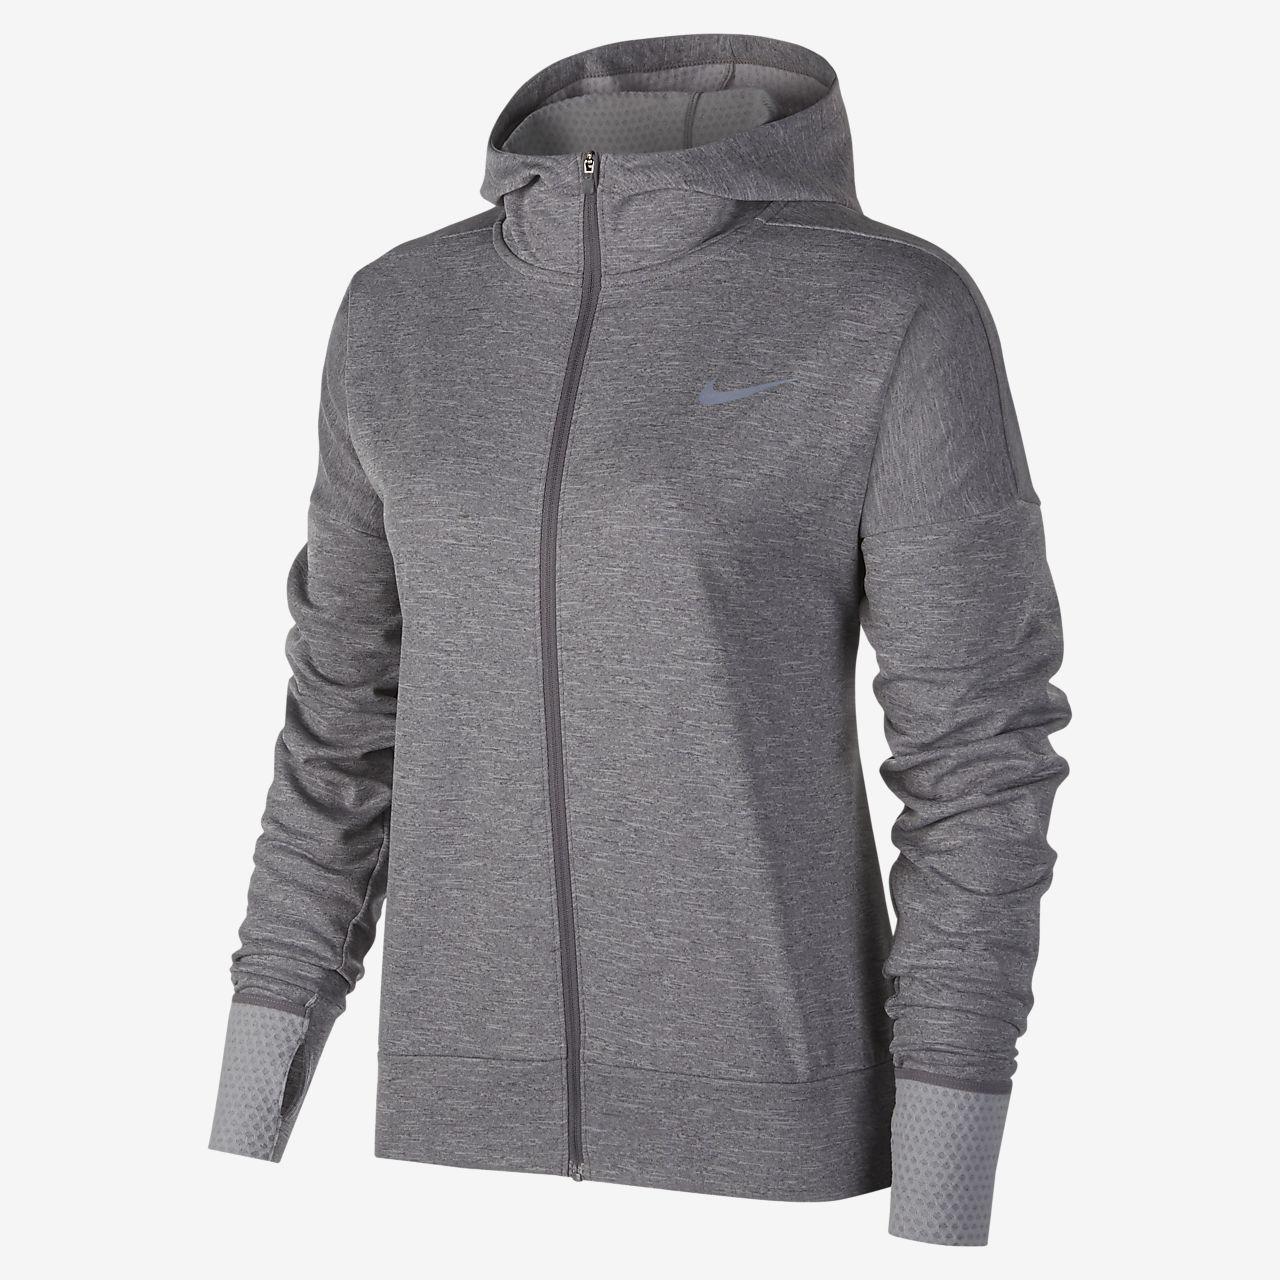 d80ceb3c1b58 Sweat à capuche de running Nike Therma Sphere pour Femme. Nike.com FR